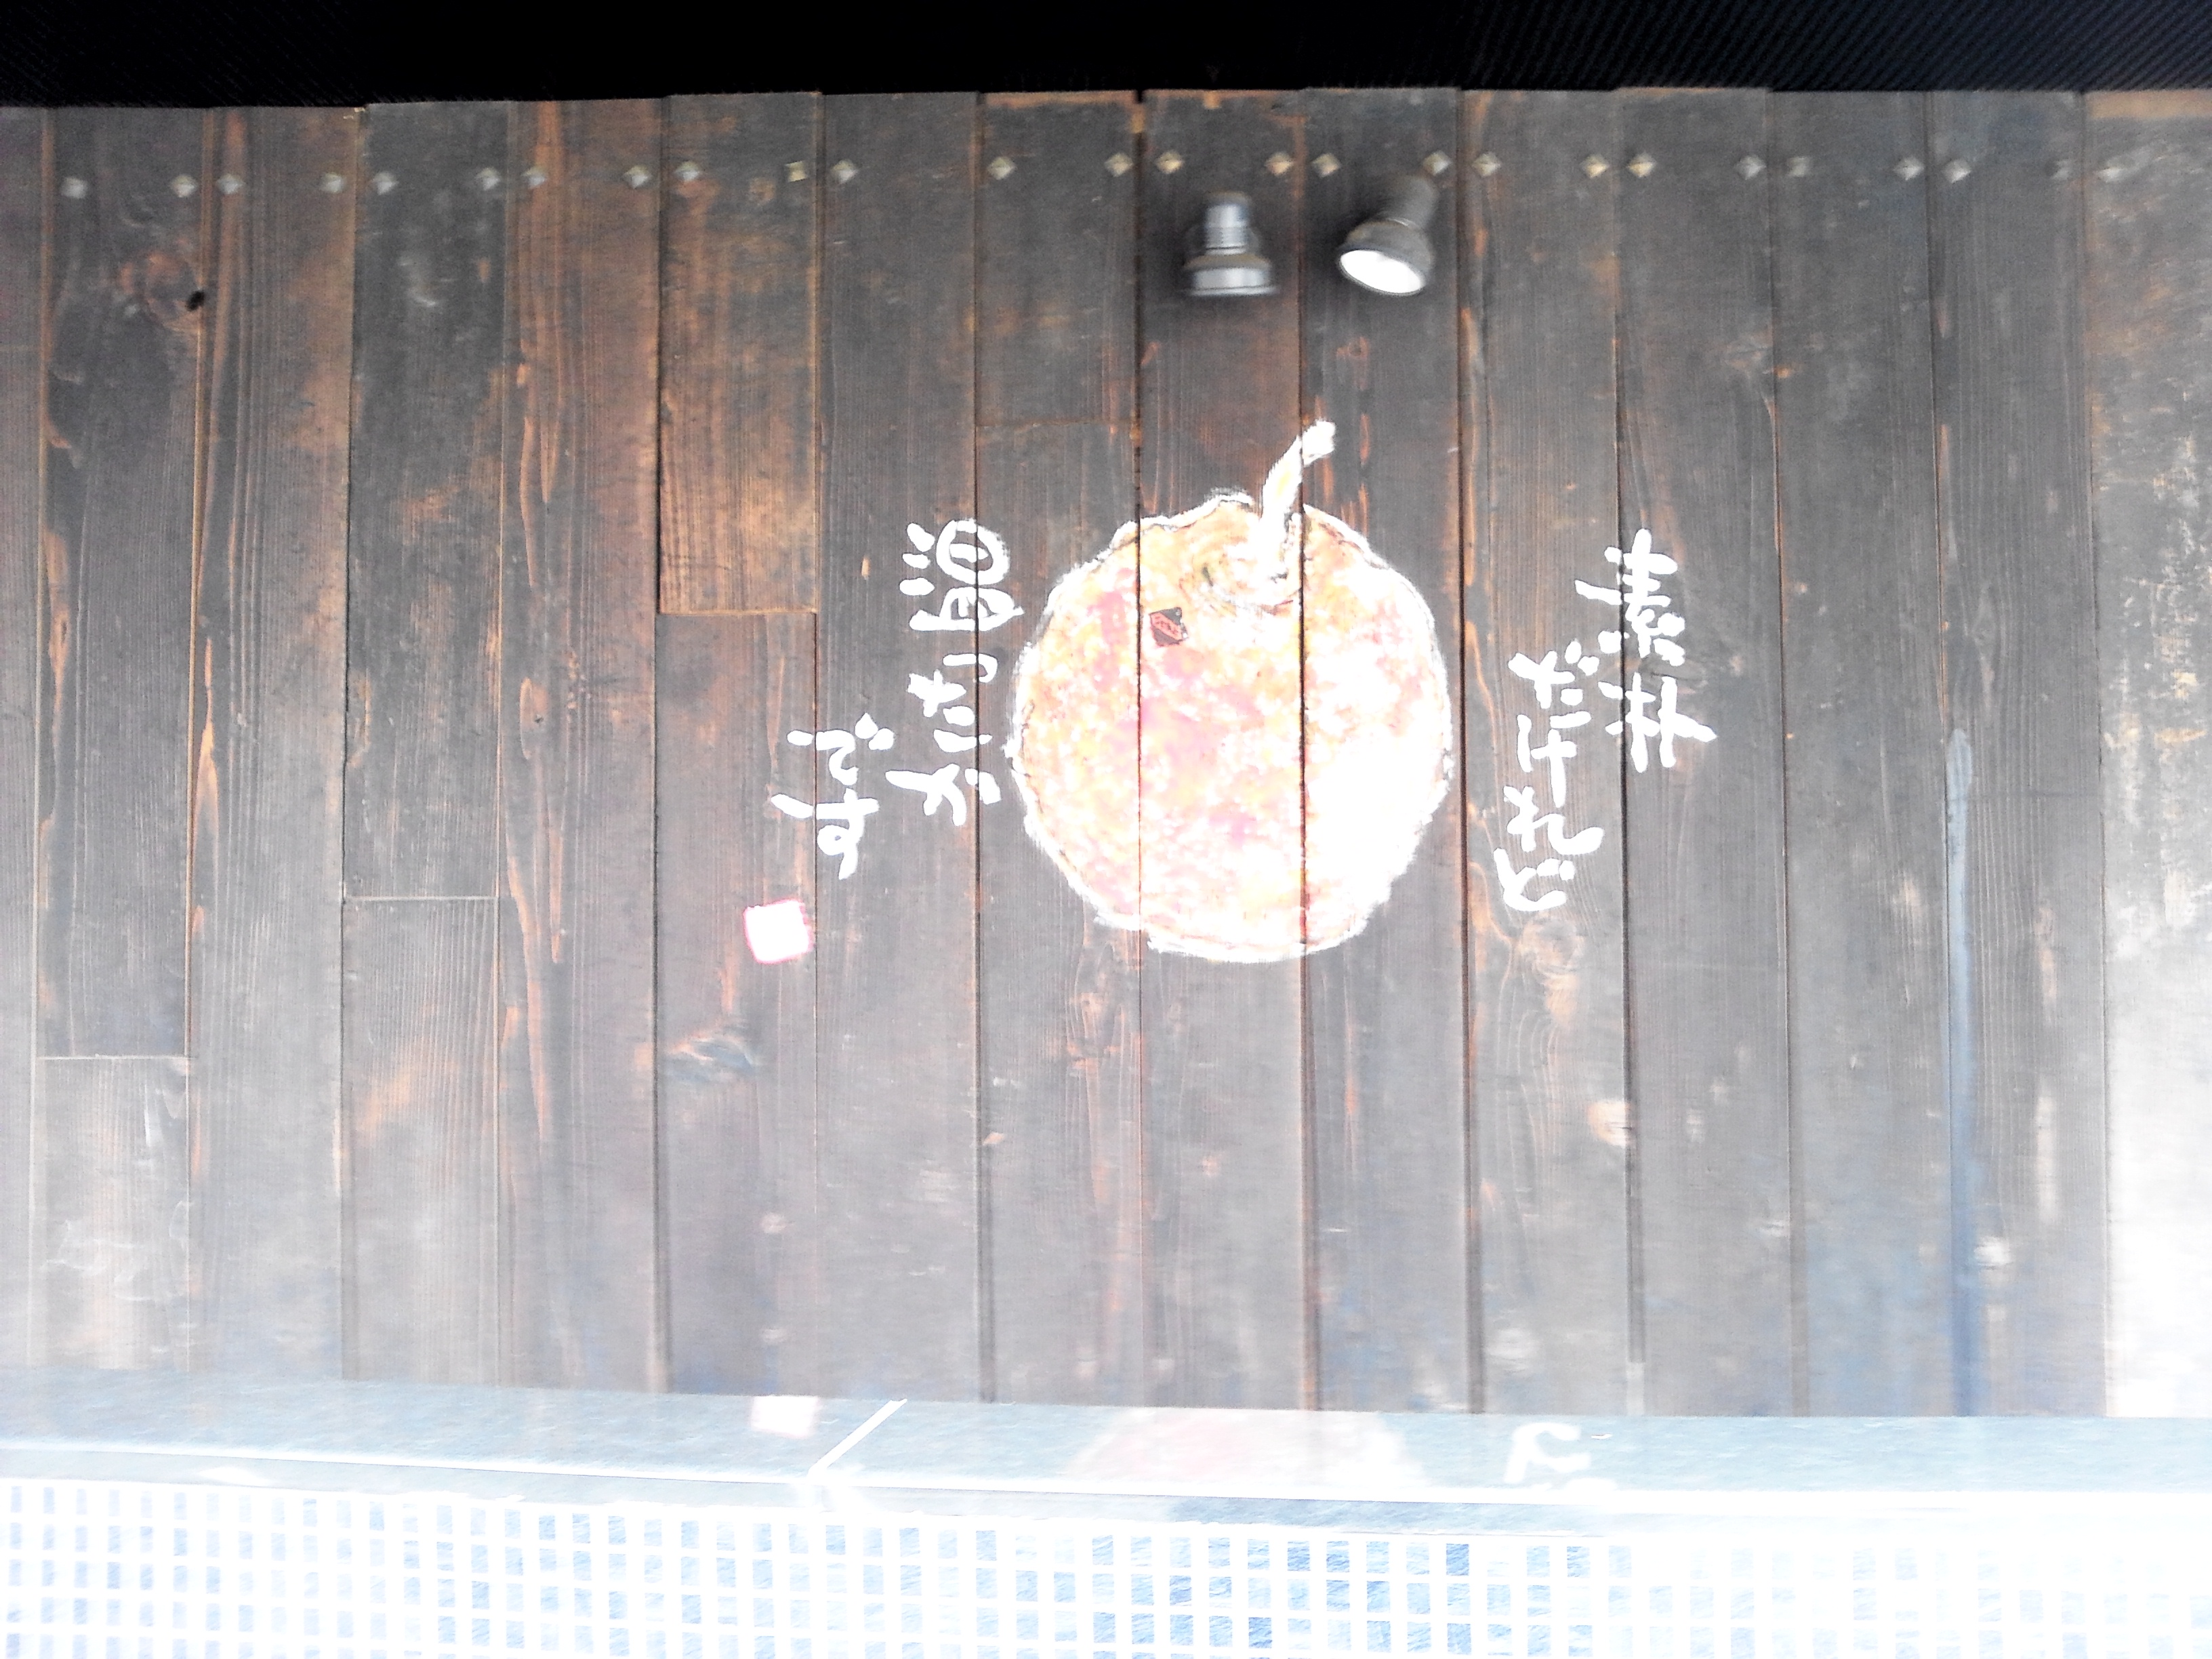 NCM_0013.JPG